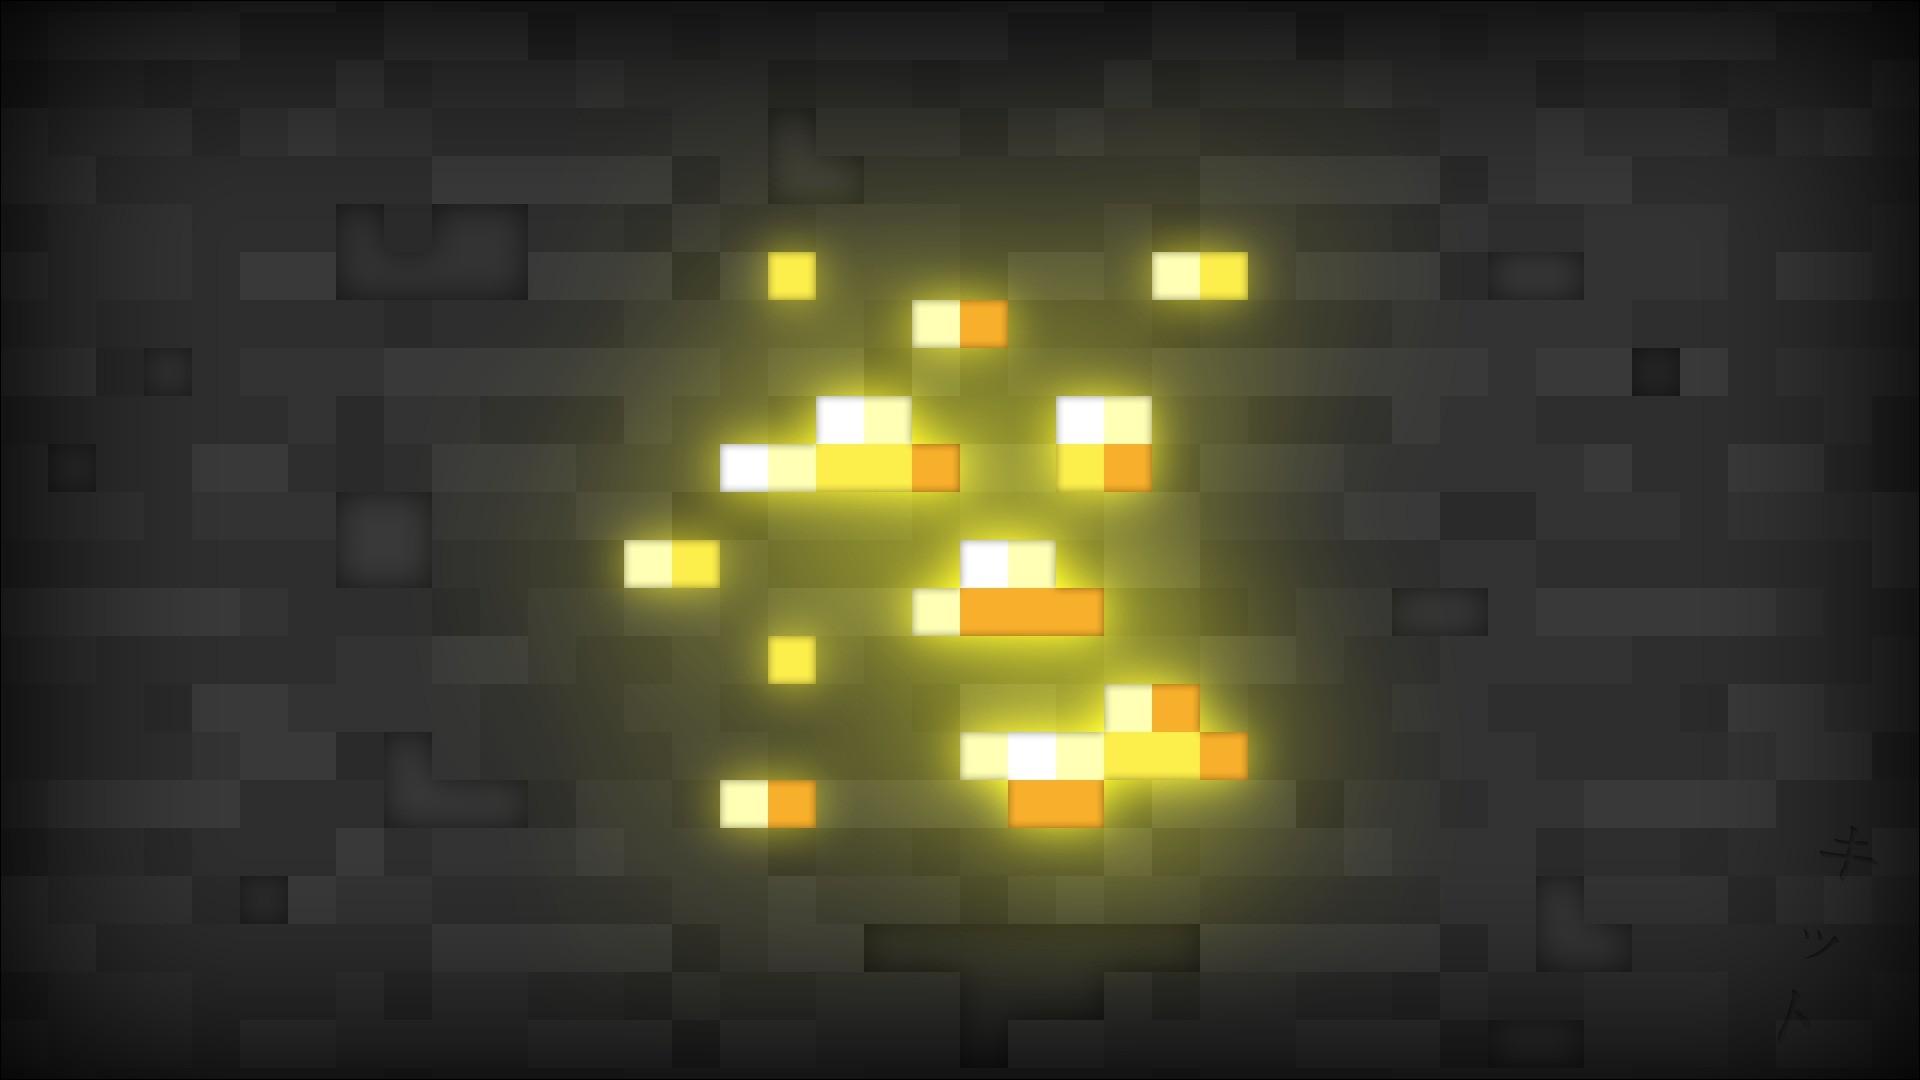 Minecraft Gold Block   Nexus Wallpaper 1920x1080